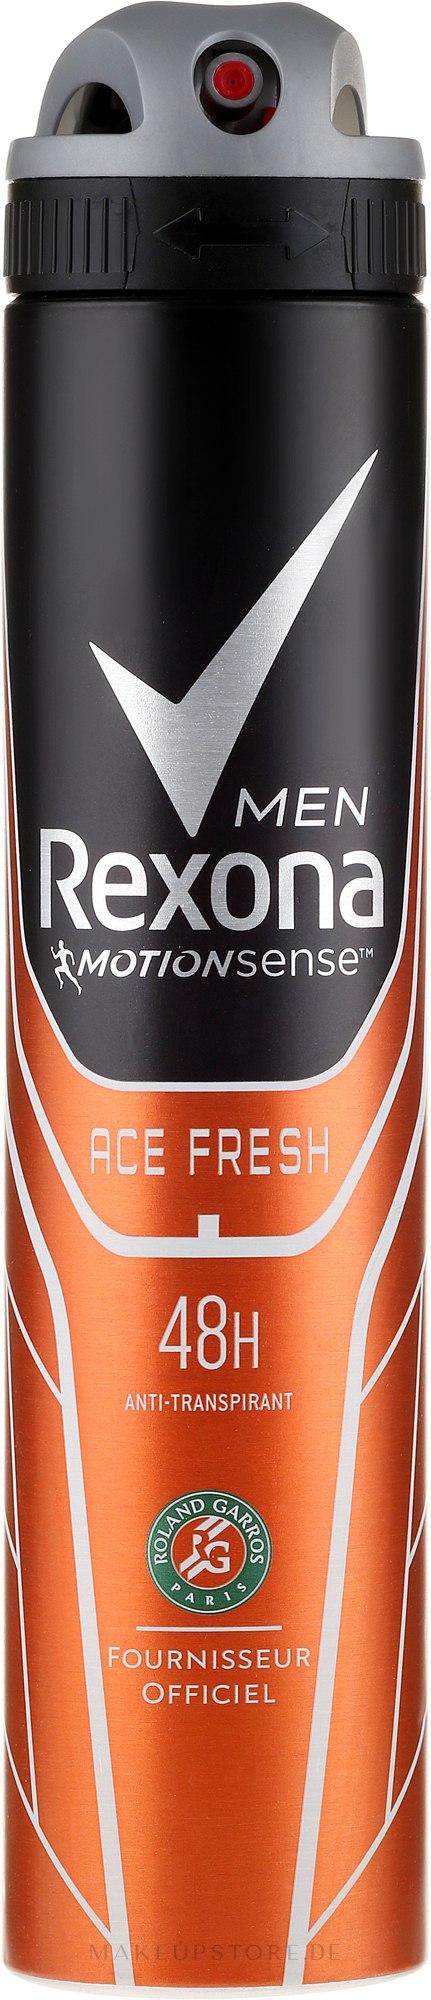 Deospray Antitranspirant - Rexona Ace Fresh Men Deodorant Spray  — Bild 200 ml